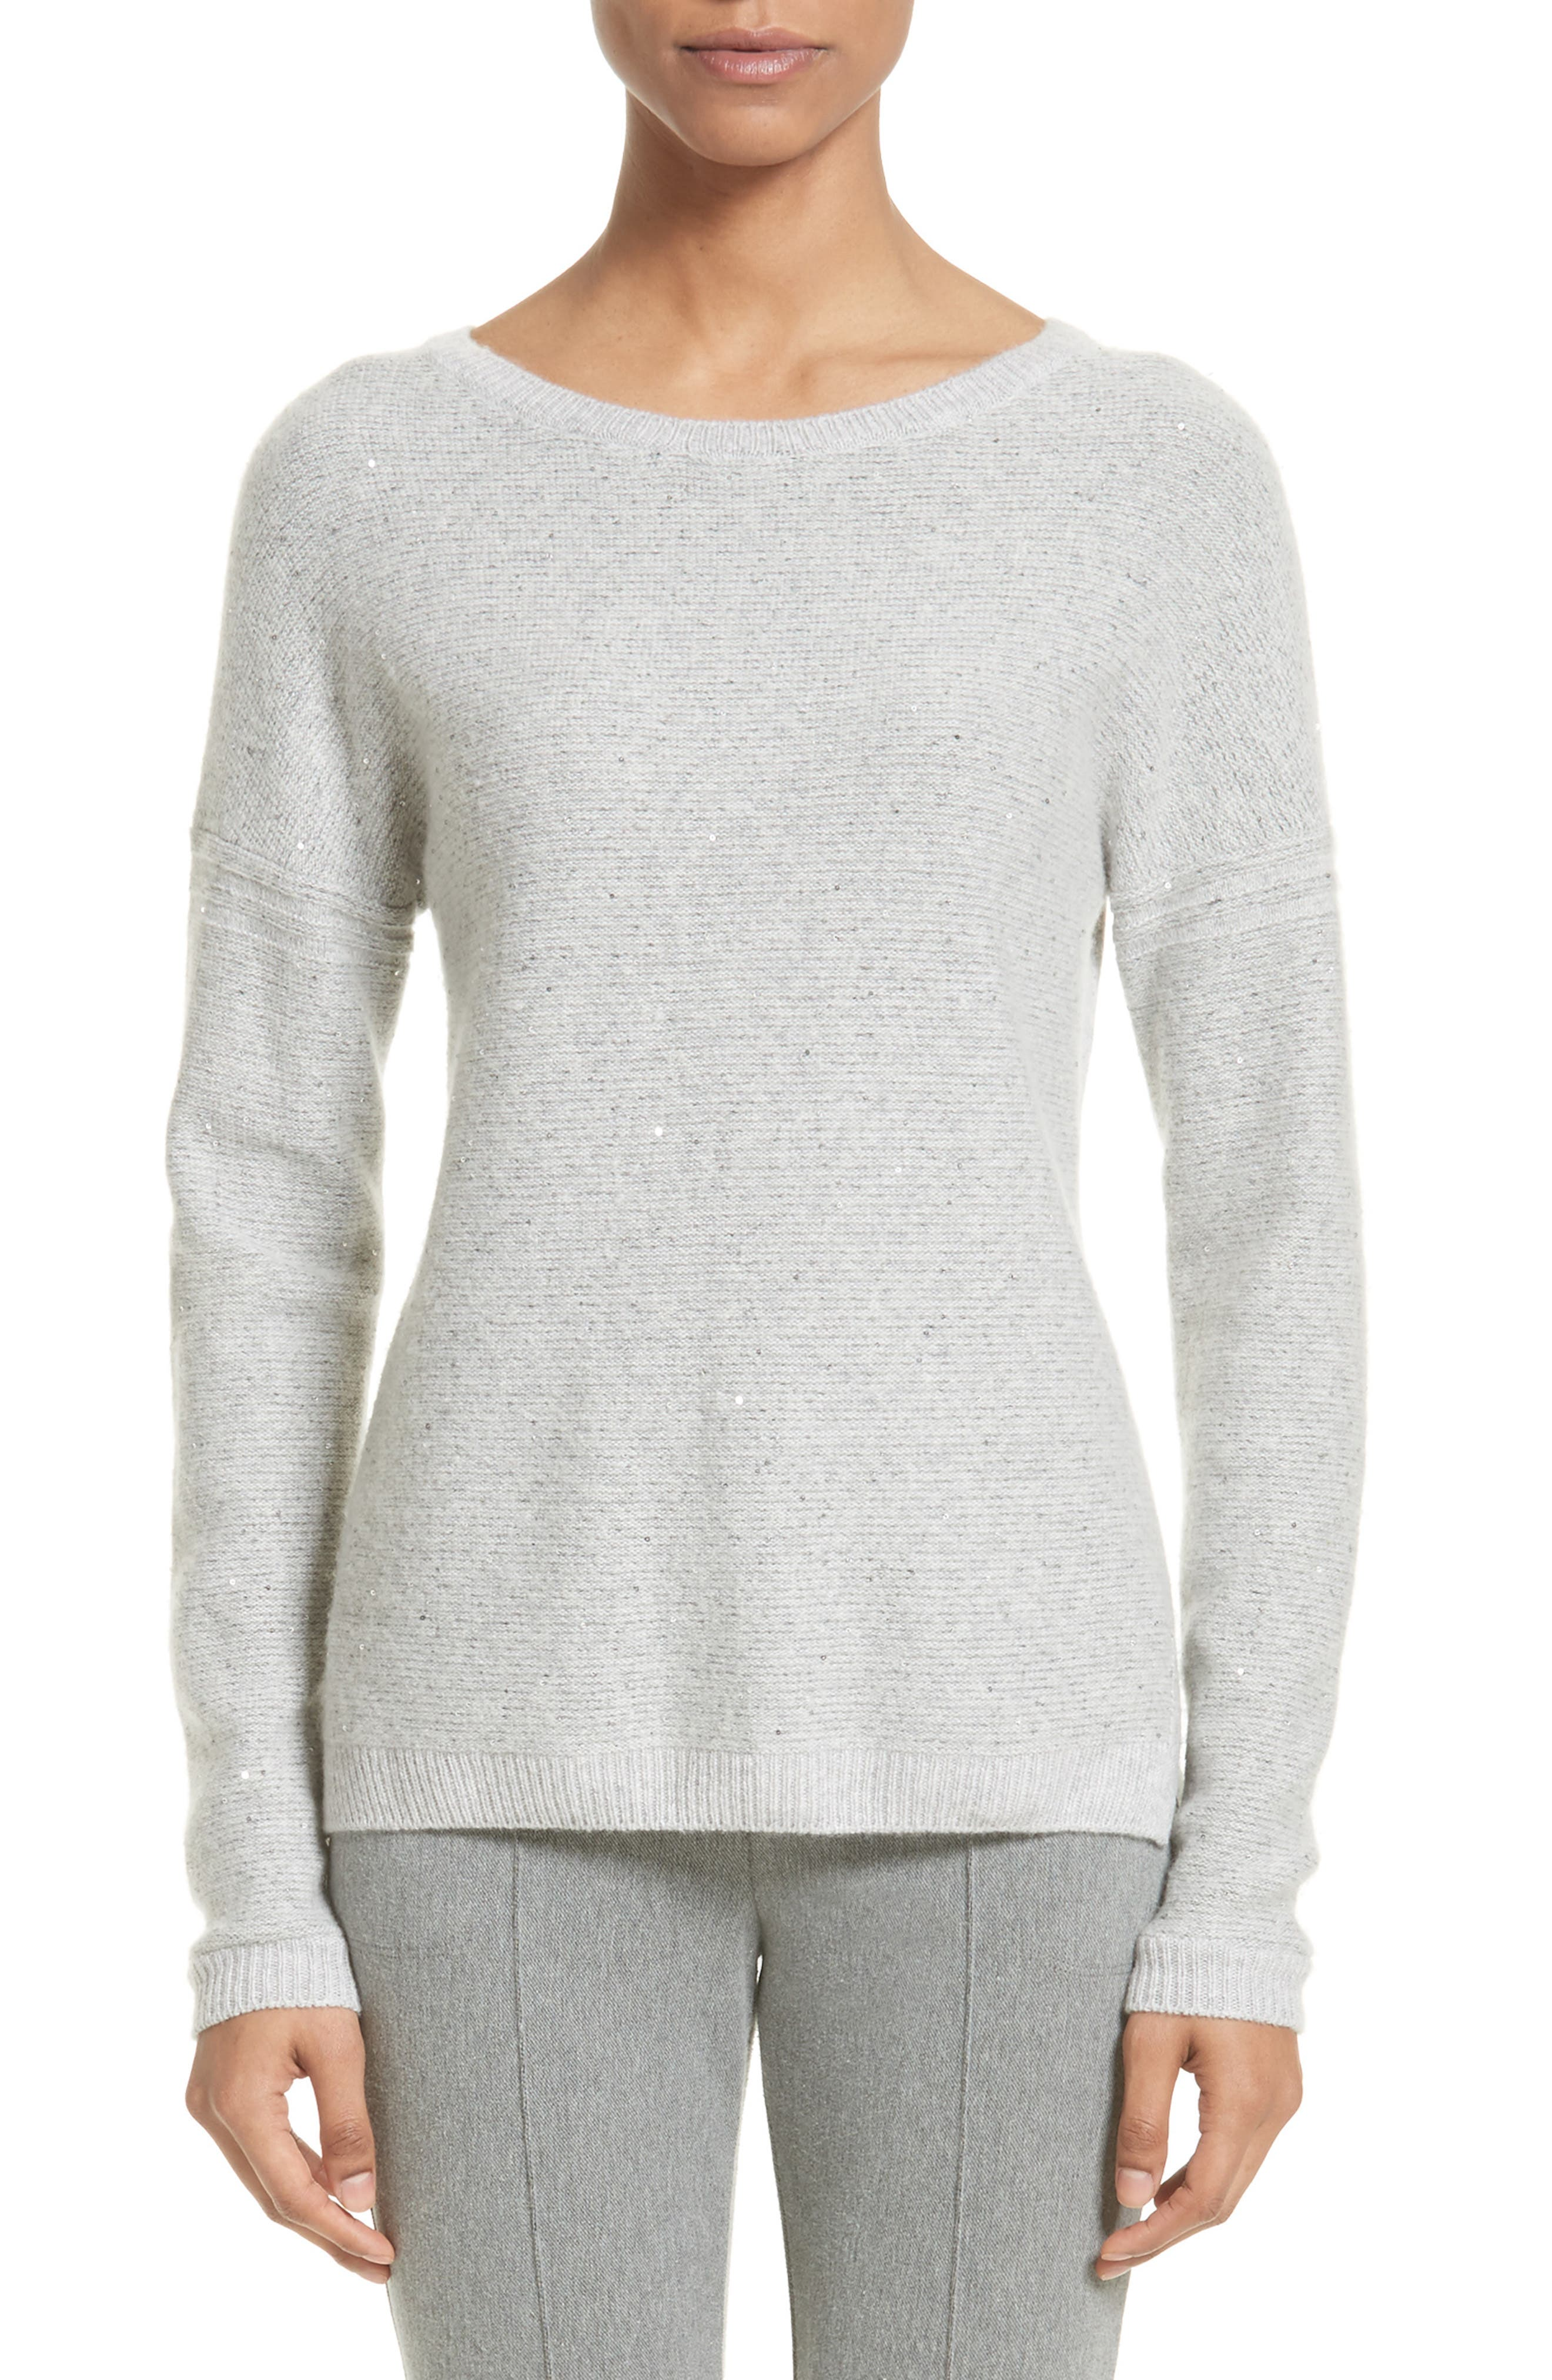 Micro Sequin Stripe Reverse Jersey Cashmere Blend Sweater,                             Main thumbnail 1, color,                             060